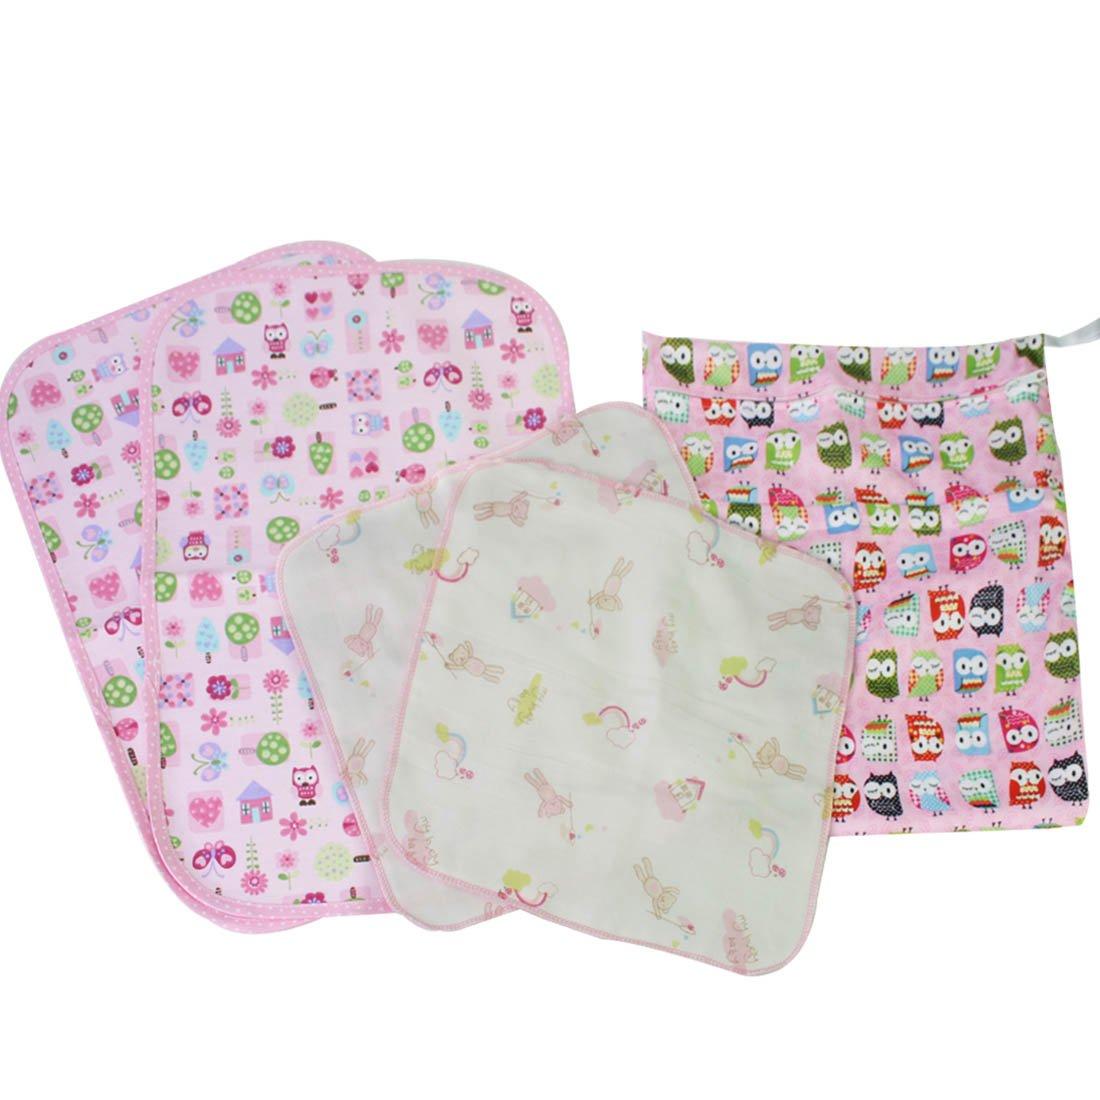 MyKazoe Baby Essentials Gift Set, Waterproof Wet Bag + 2 Waterproof Lap Pads + 2 Muslin Wipe Cloth - Set of 5 (Pink Owl) by MyKazoe